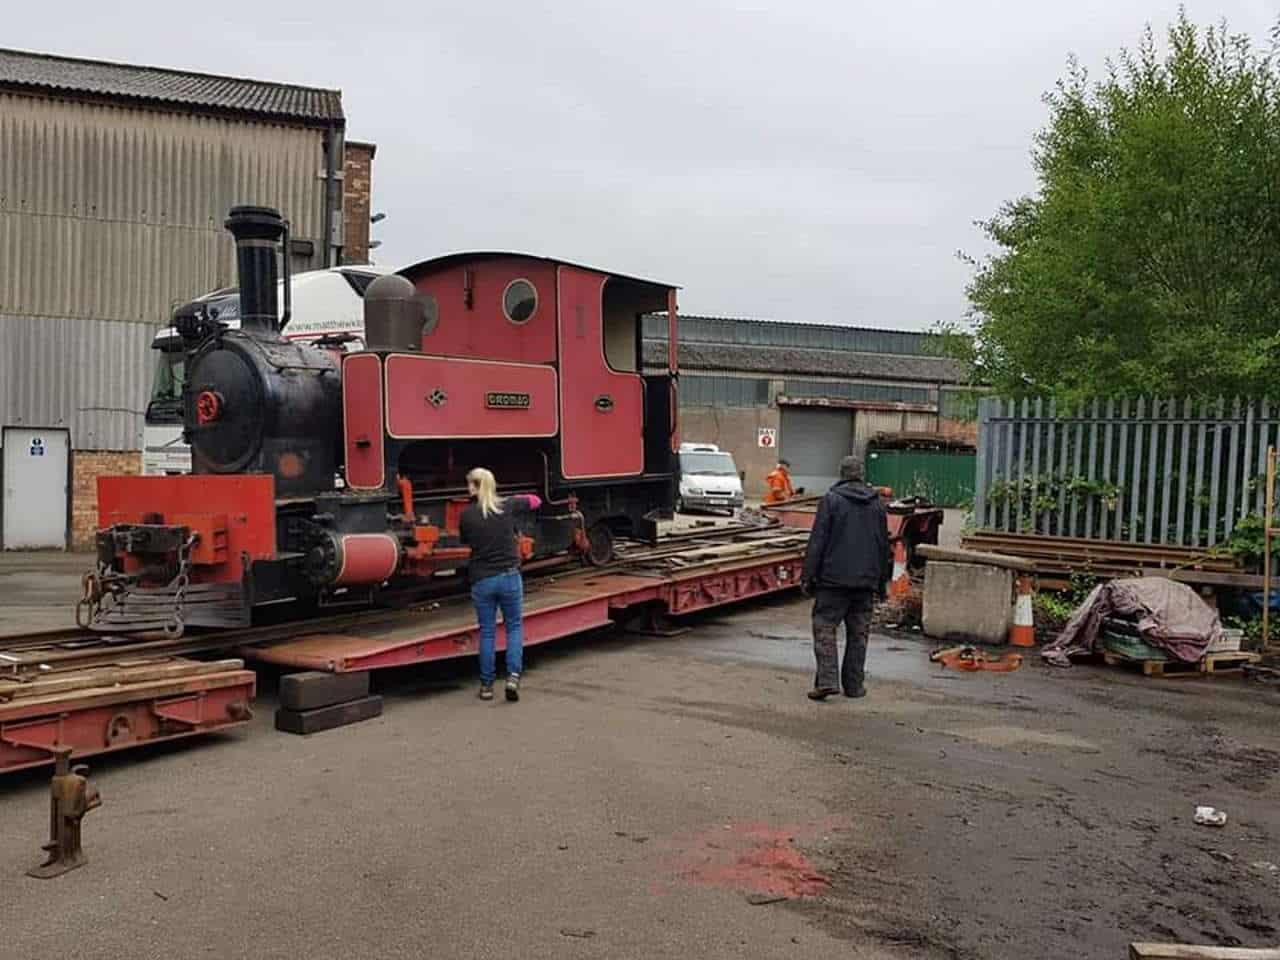 Dromad arrives at the Cavan and Leitrim Railway